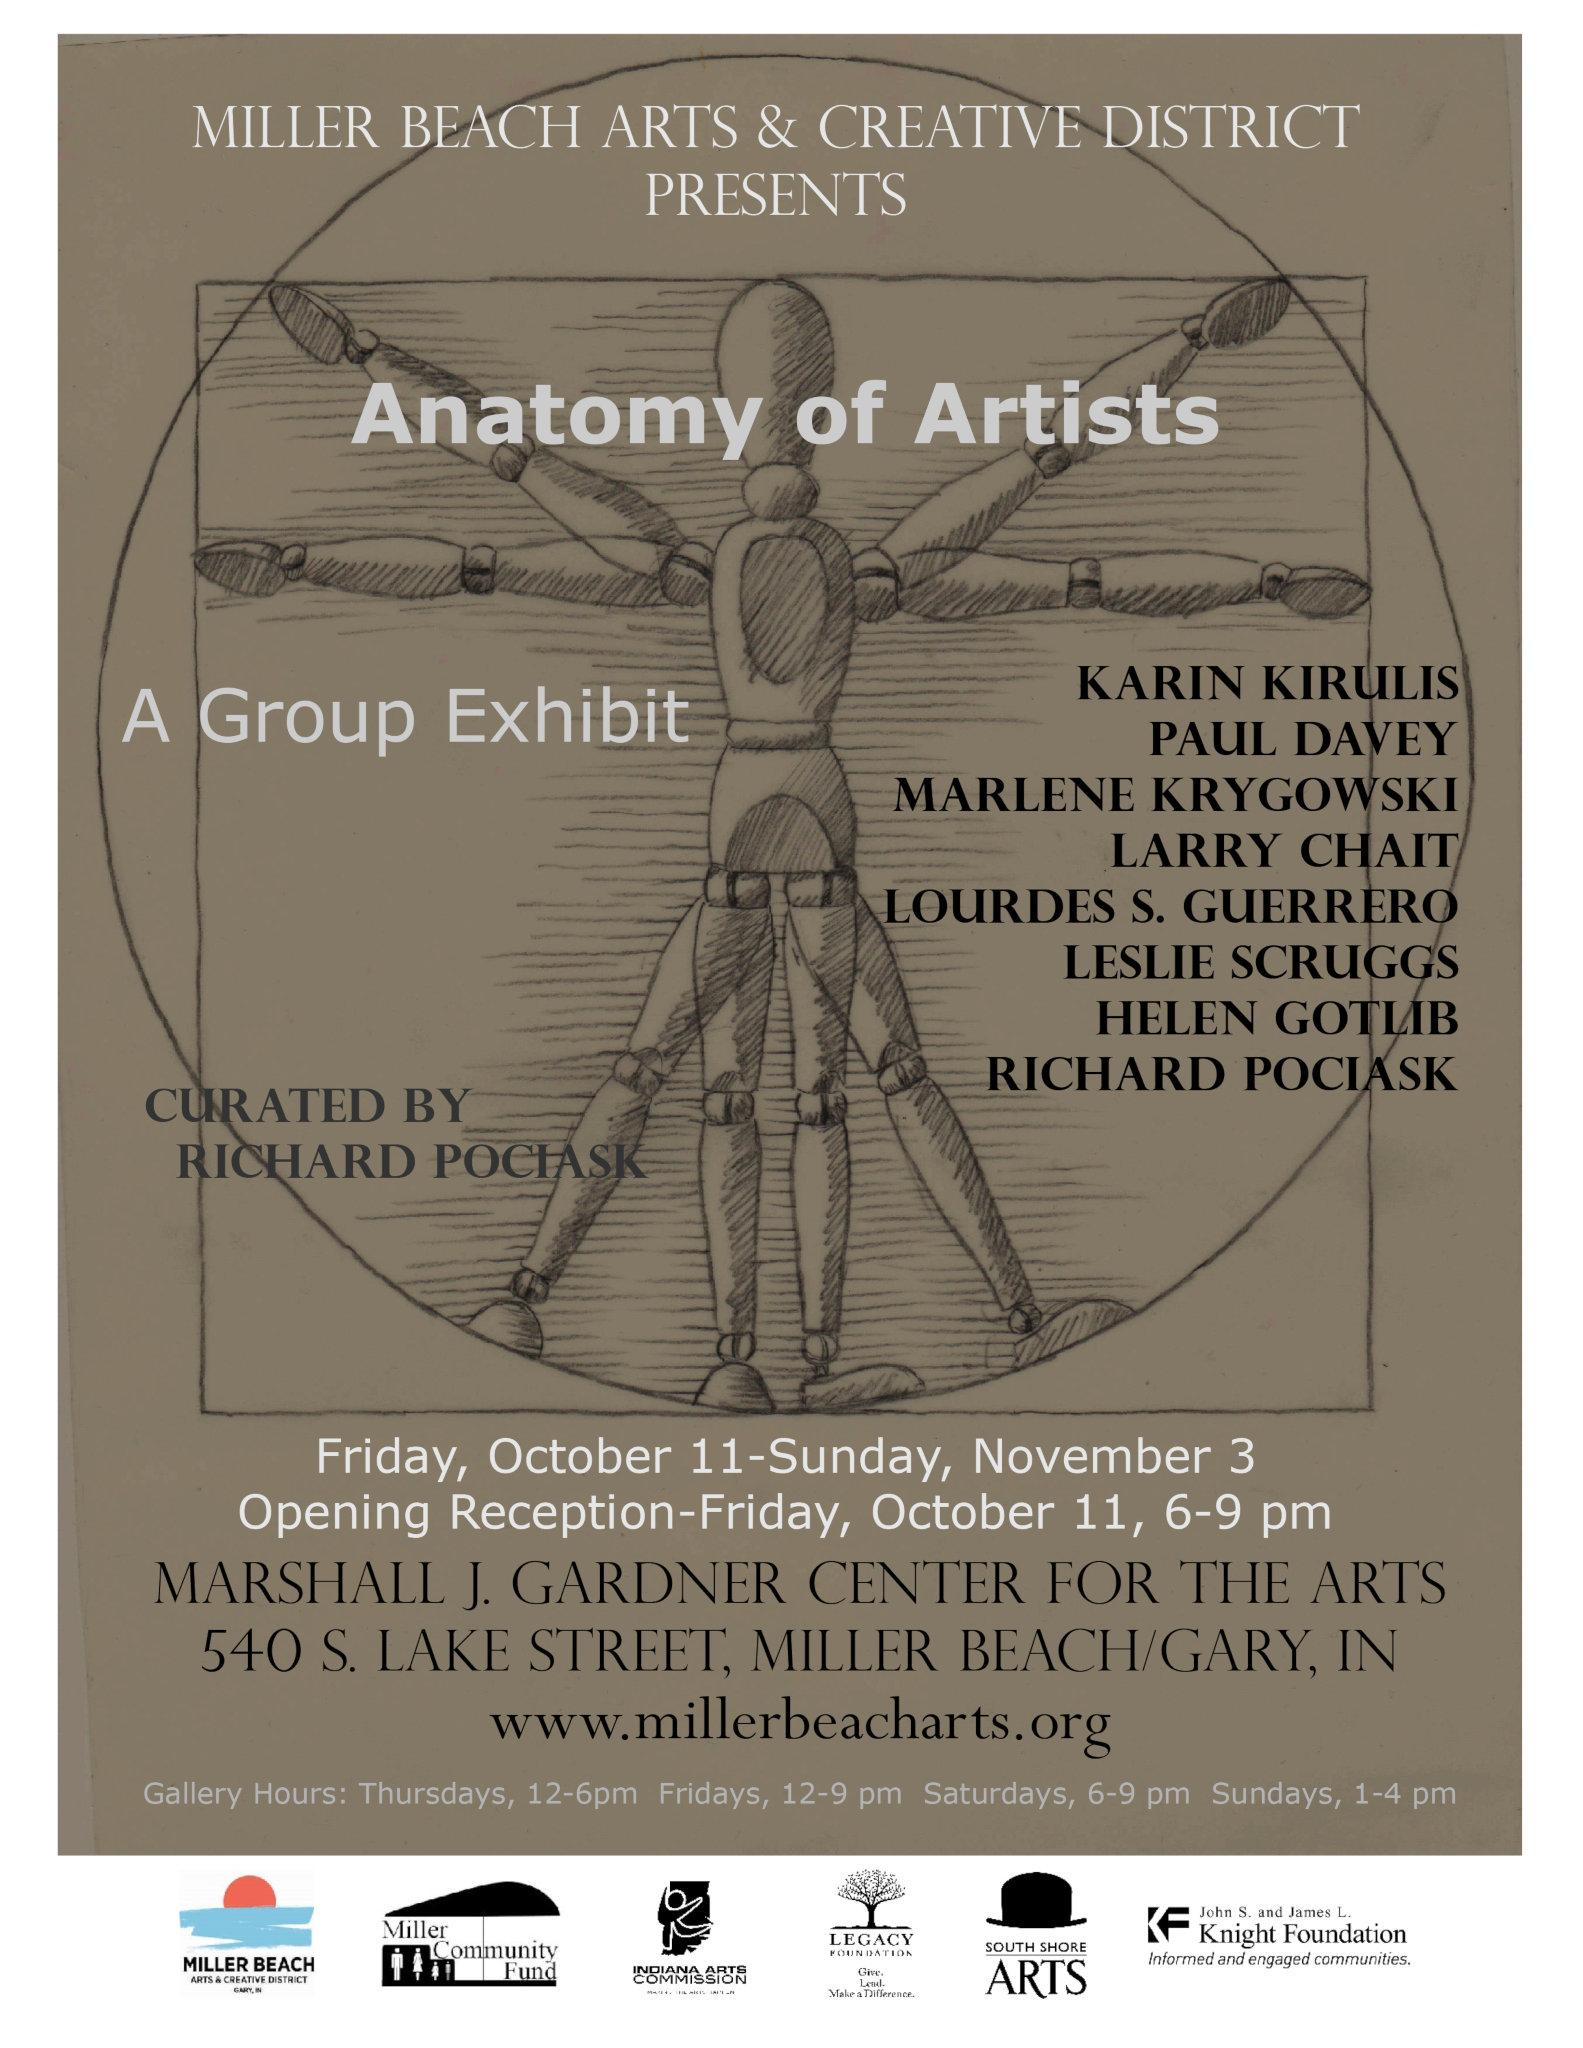 Flyer Richard Pociask Anatomy of Artists 2019 01 11